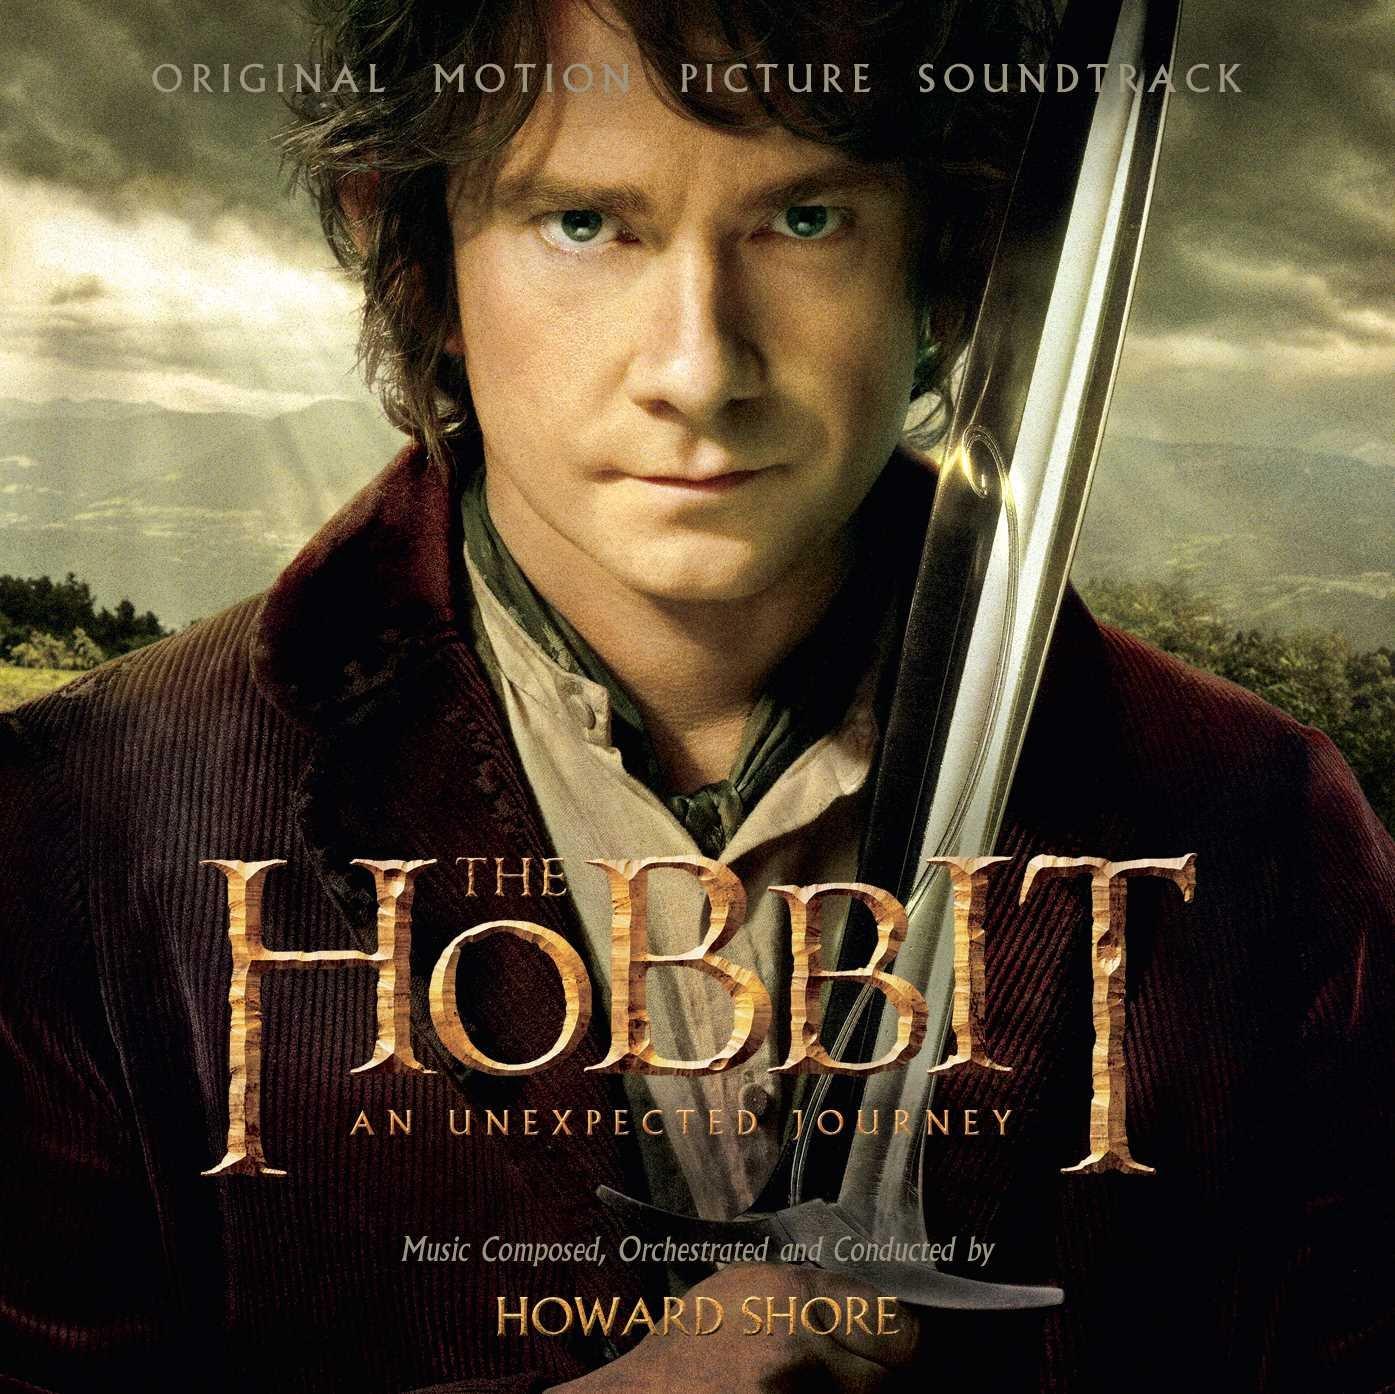 Howard Shore. OST The Hobbit: An Unexpected Journey. Original Motion Picture Soundtrack ховард шор howard shore the hobbit an unexpected journey original motion picture soundtrack 2 cd